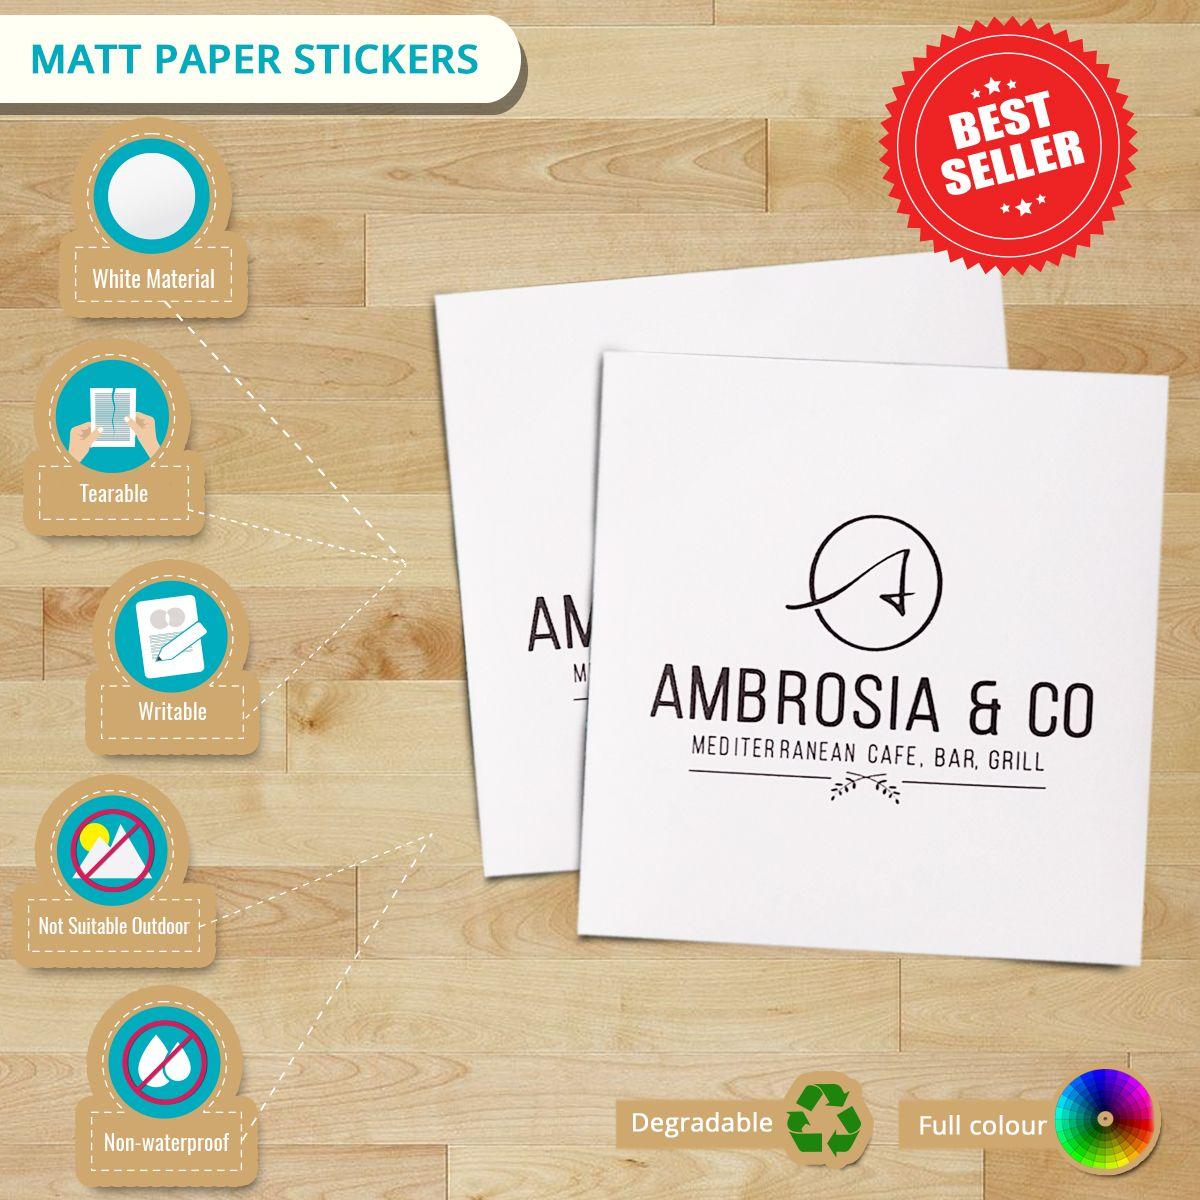 Art Paper Stickers | Infographics | Sticker paper, Stickers